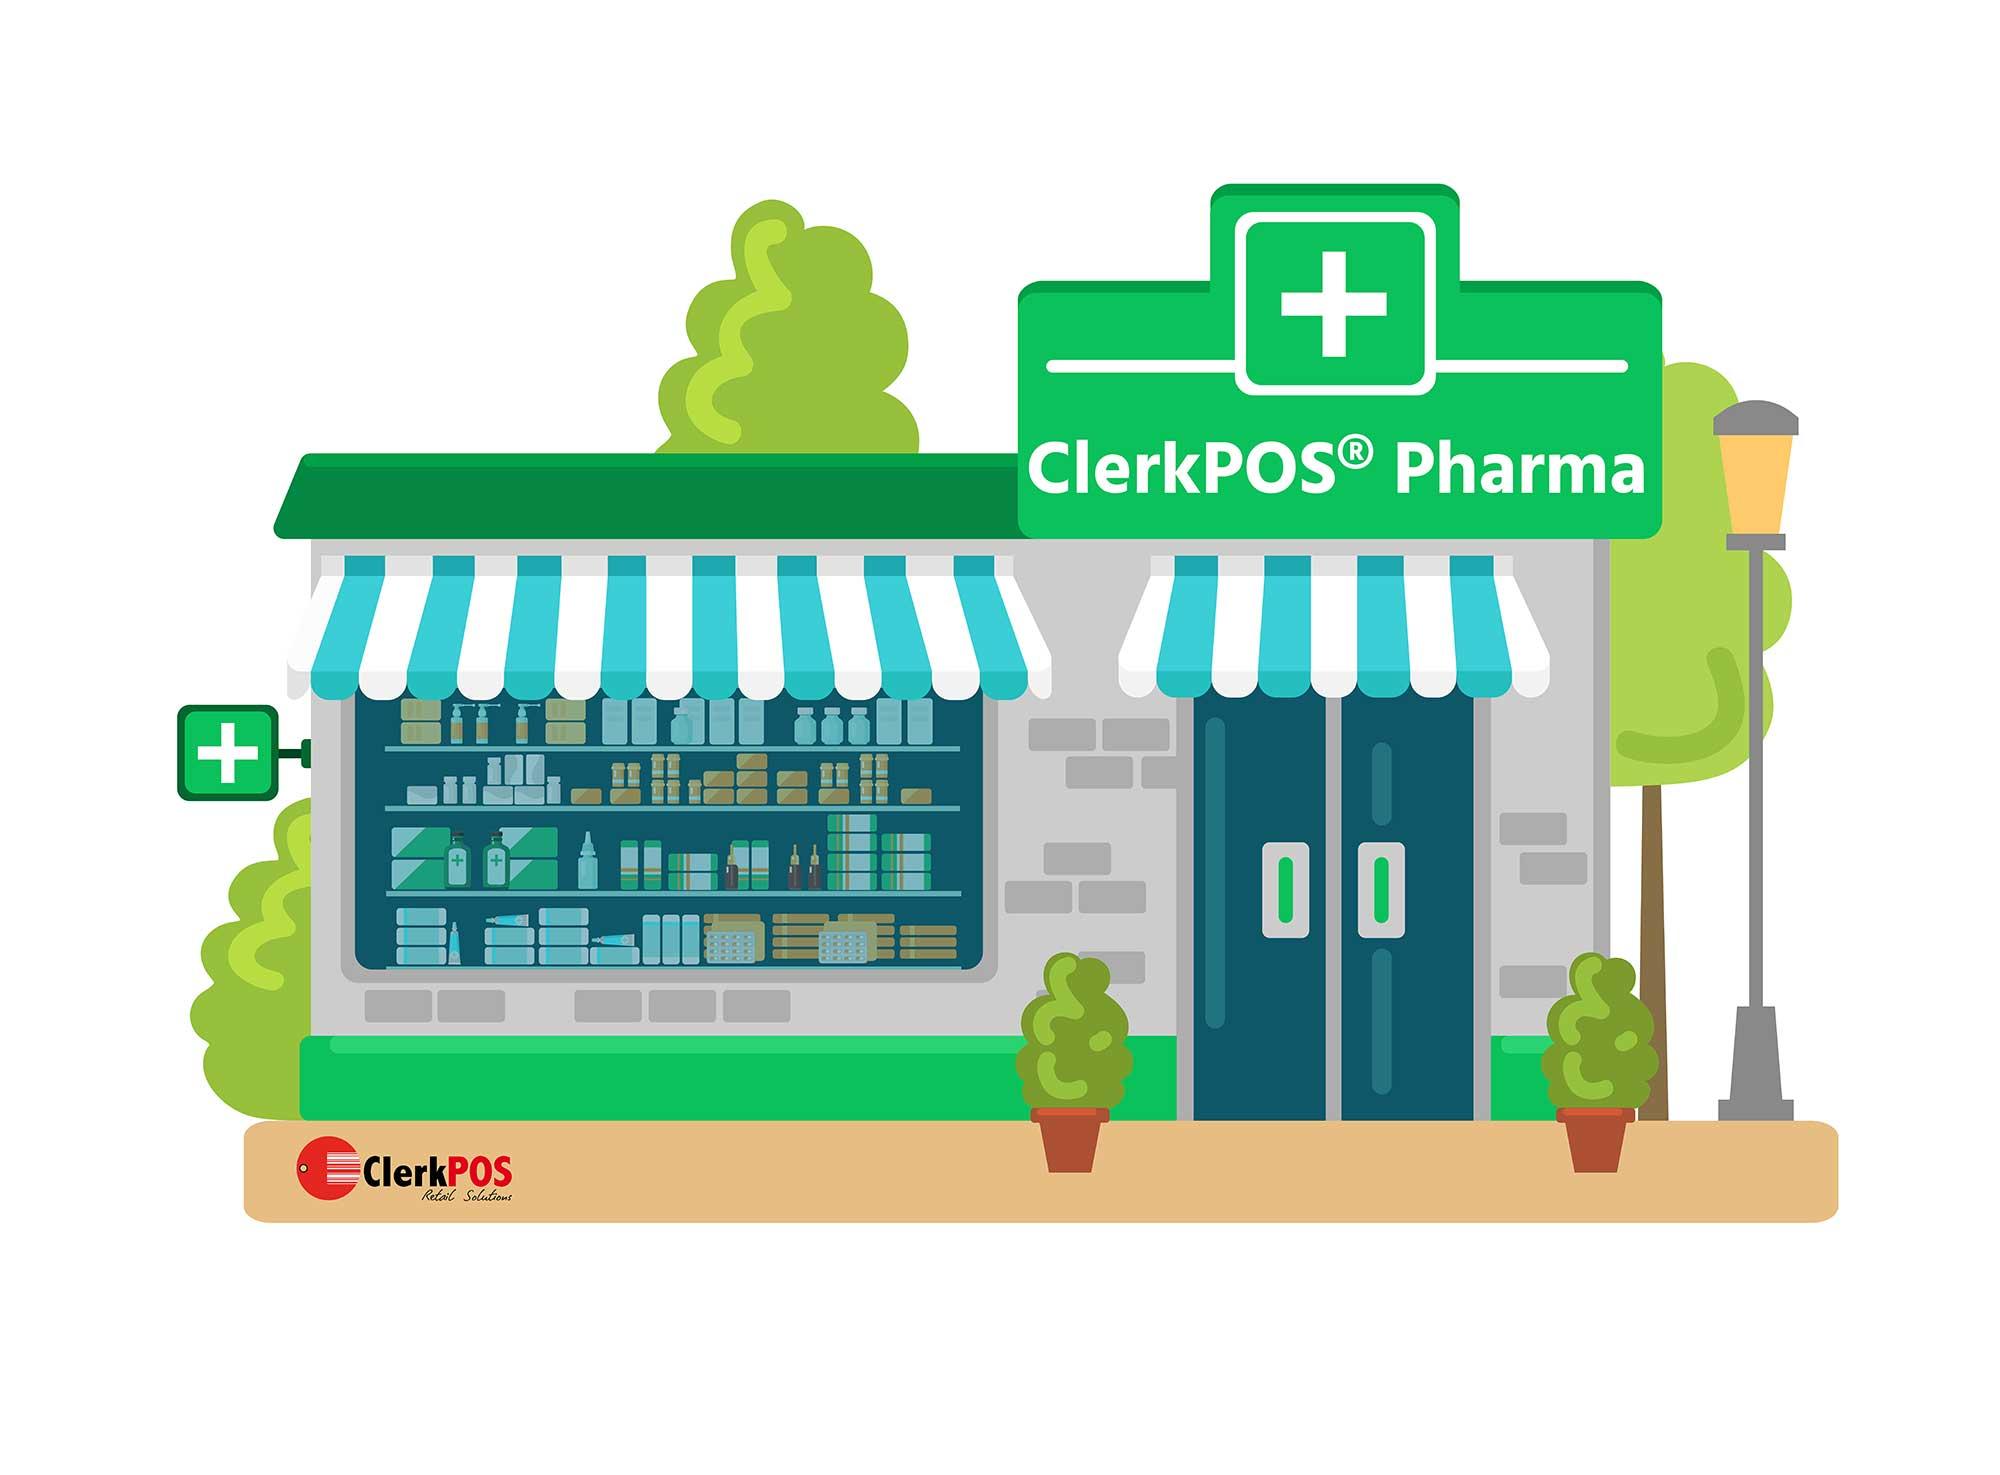 ClerkPOS-Pharma-02